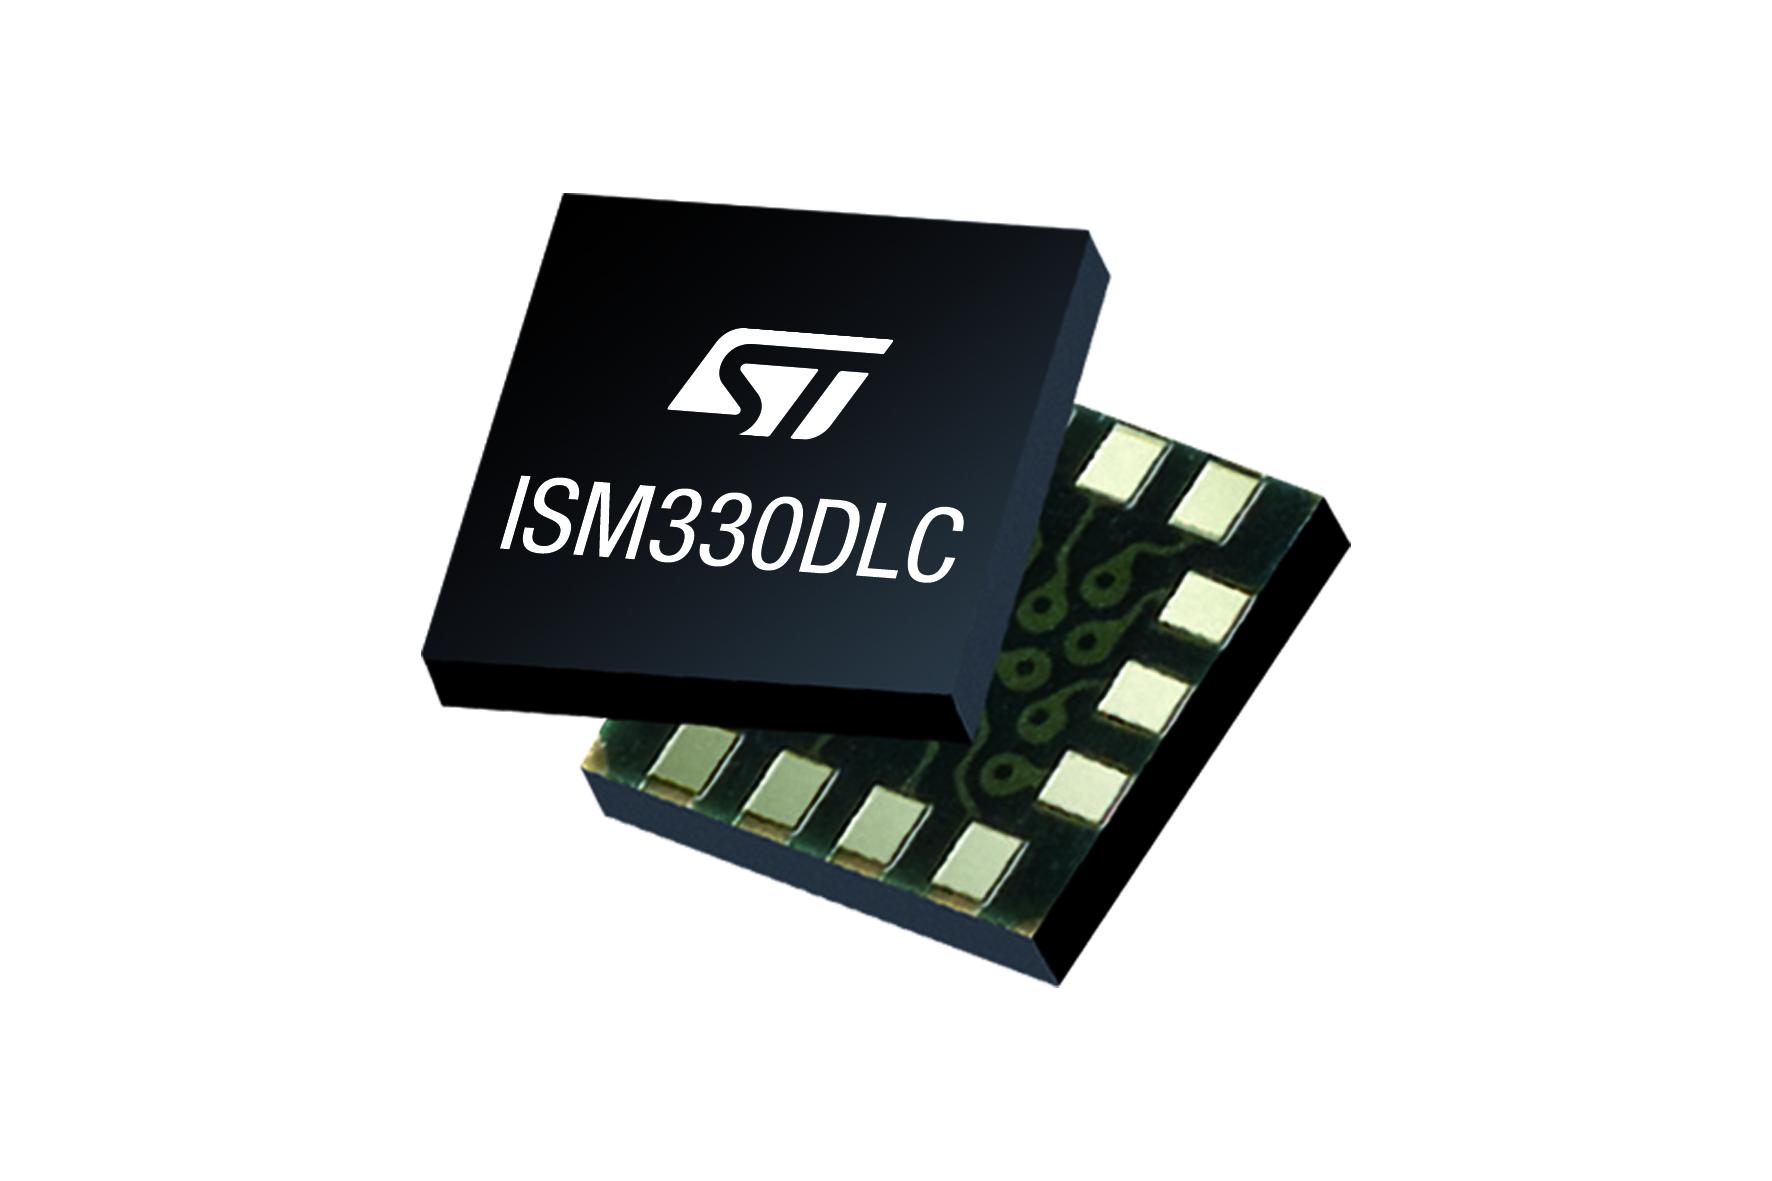 RS9748_ILL-ISM330DLC.jpg